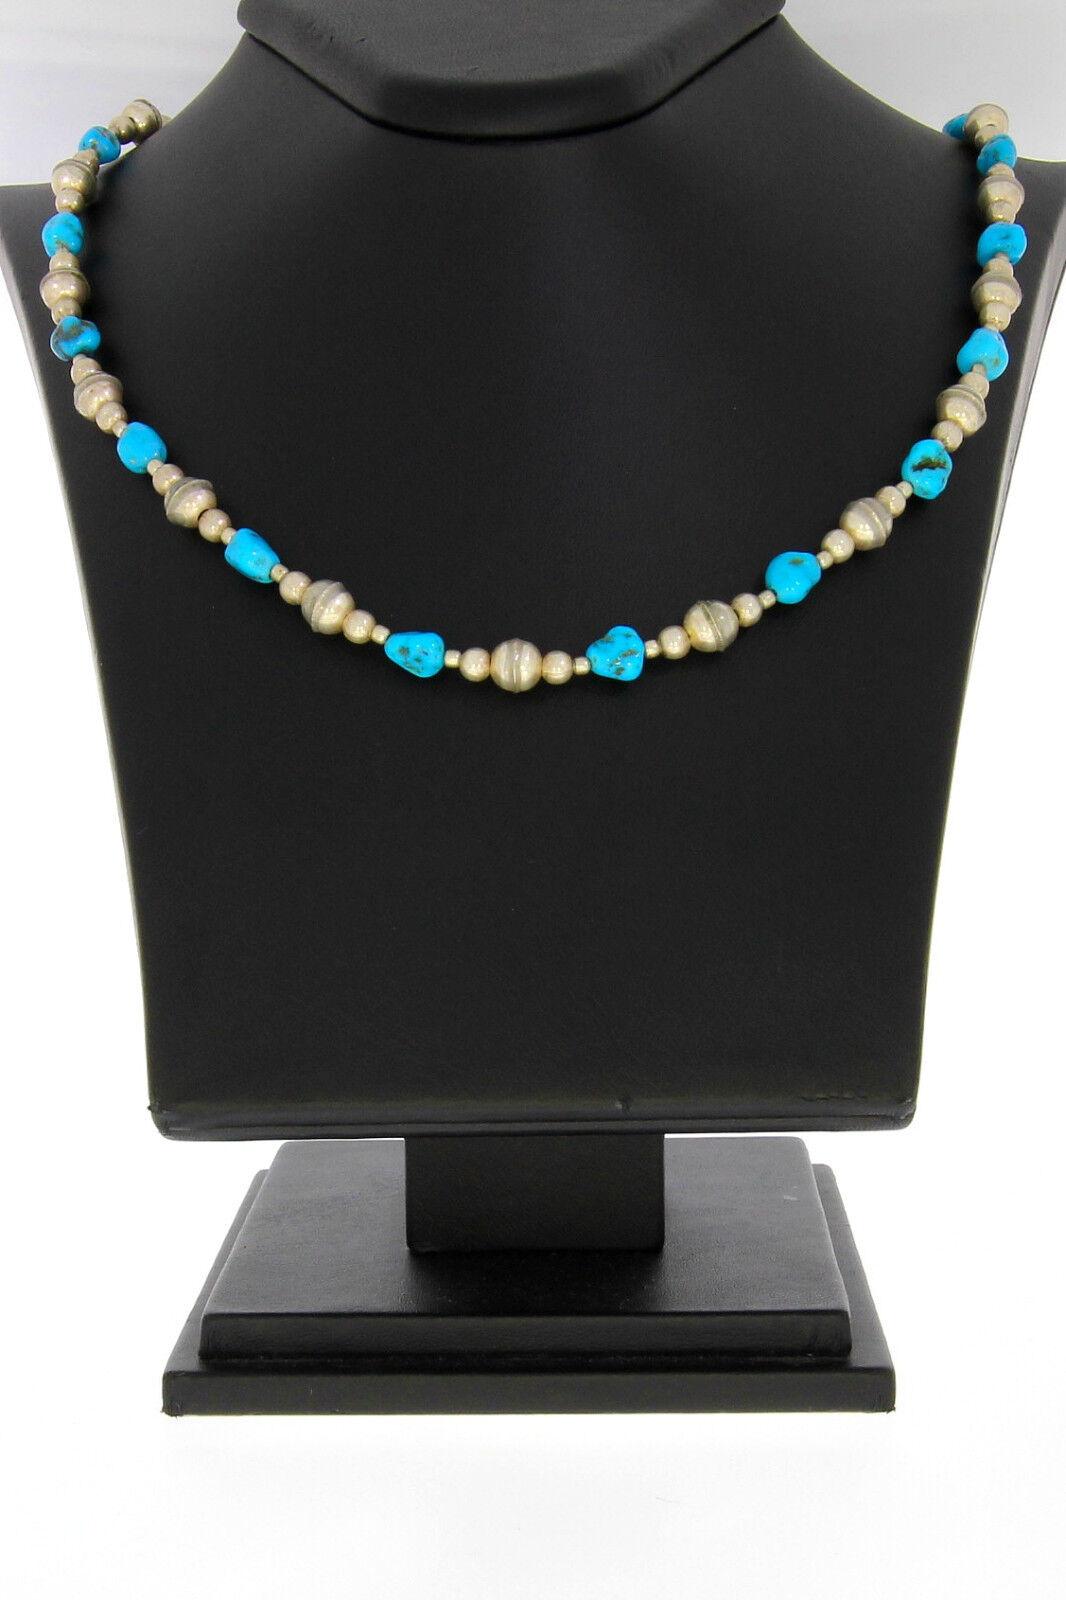 7265-925er argentoO Collie con argentoo Perle Turchese Catena Lunga 48 48 48 cm Gewi 15 3 grammi 3f2397